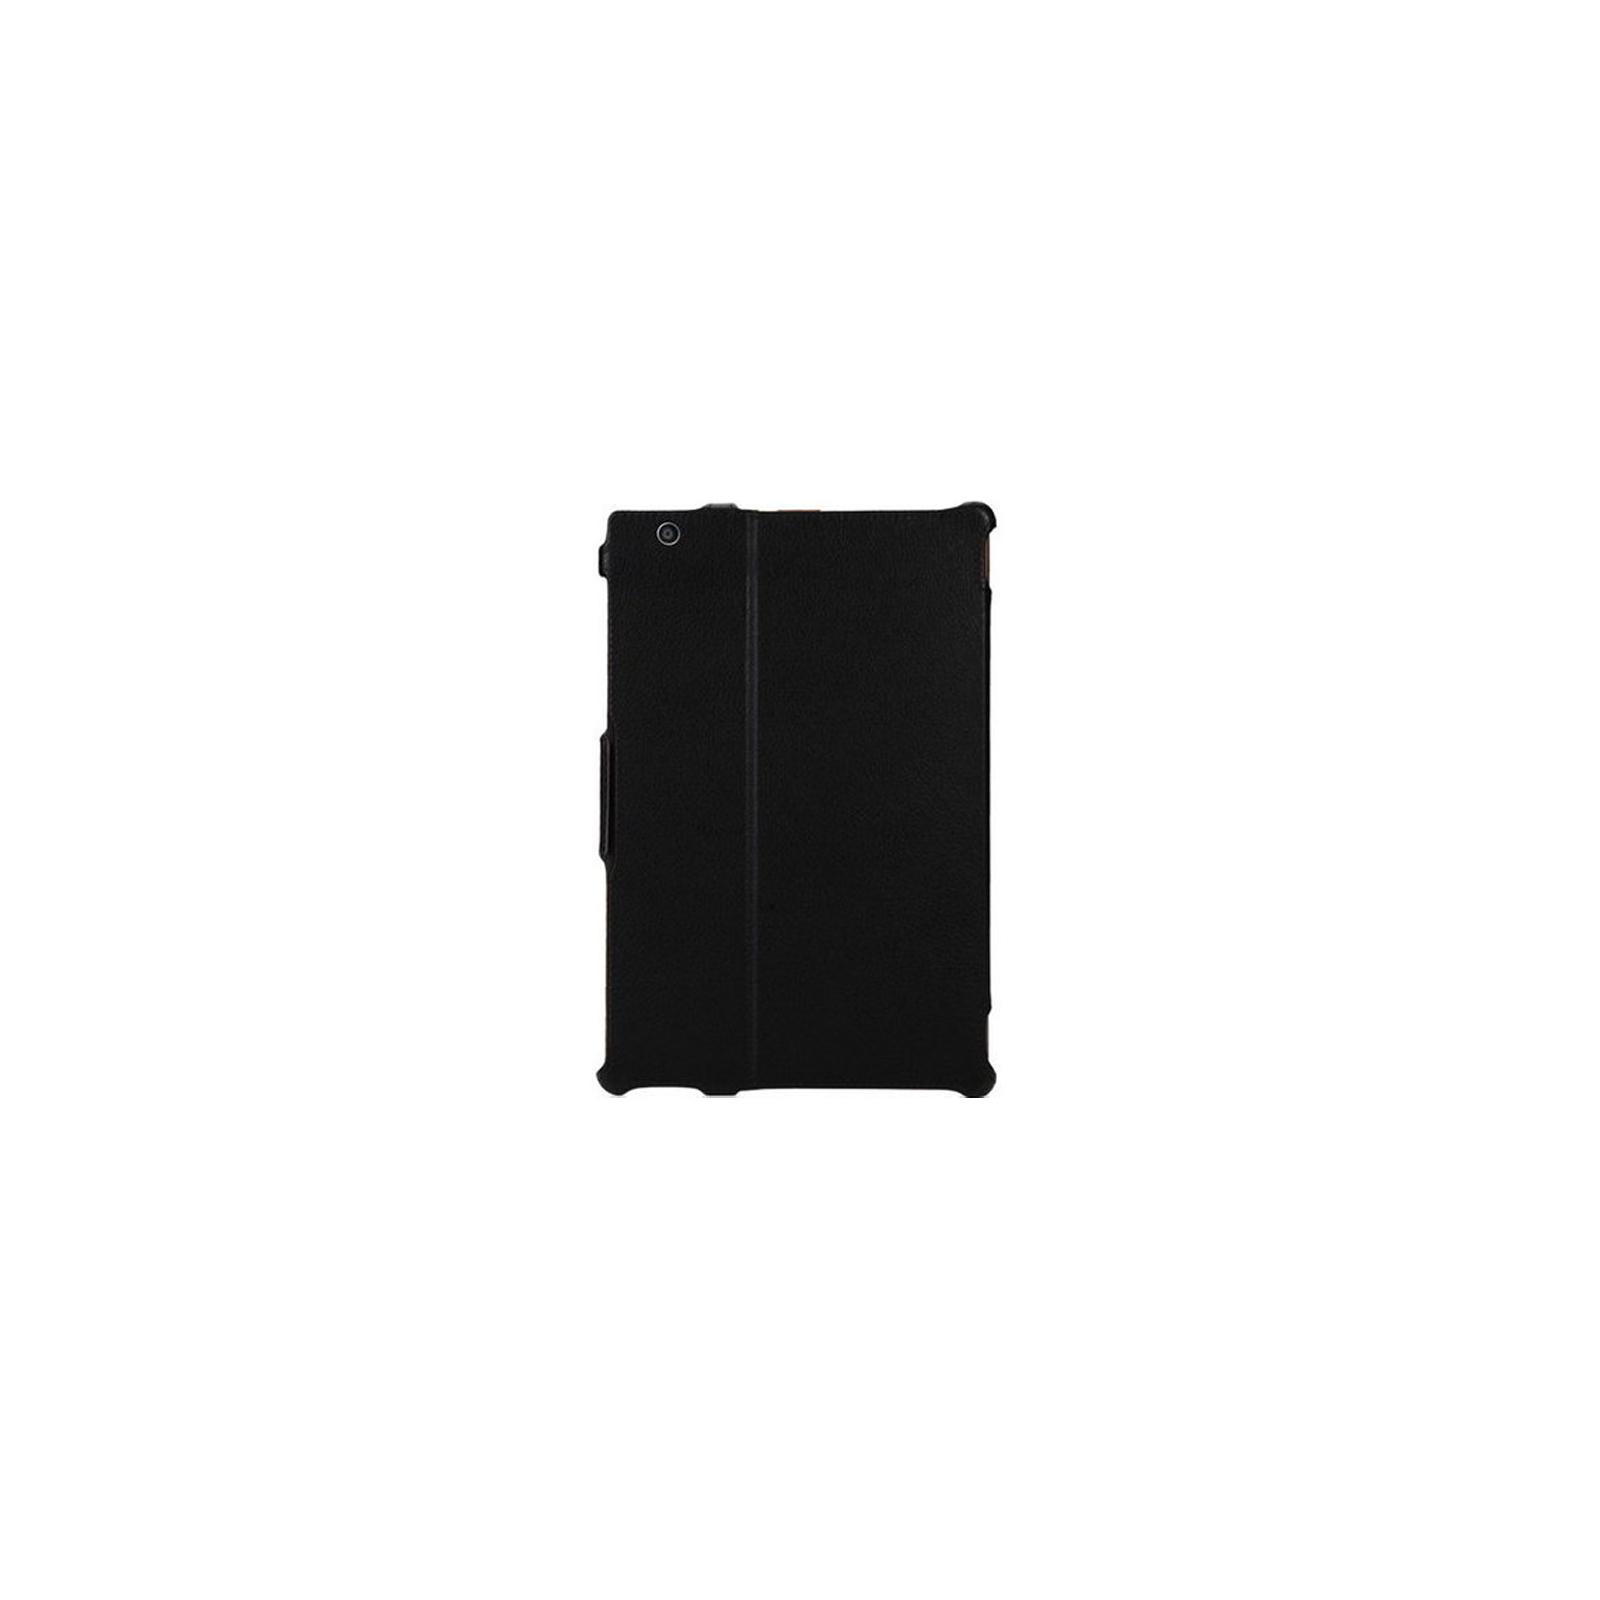 Чехол для планшета AirOn для Sony Xperia Tablet Z4 (4822356754484) изображение 2